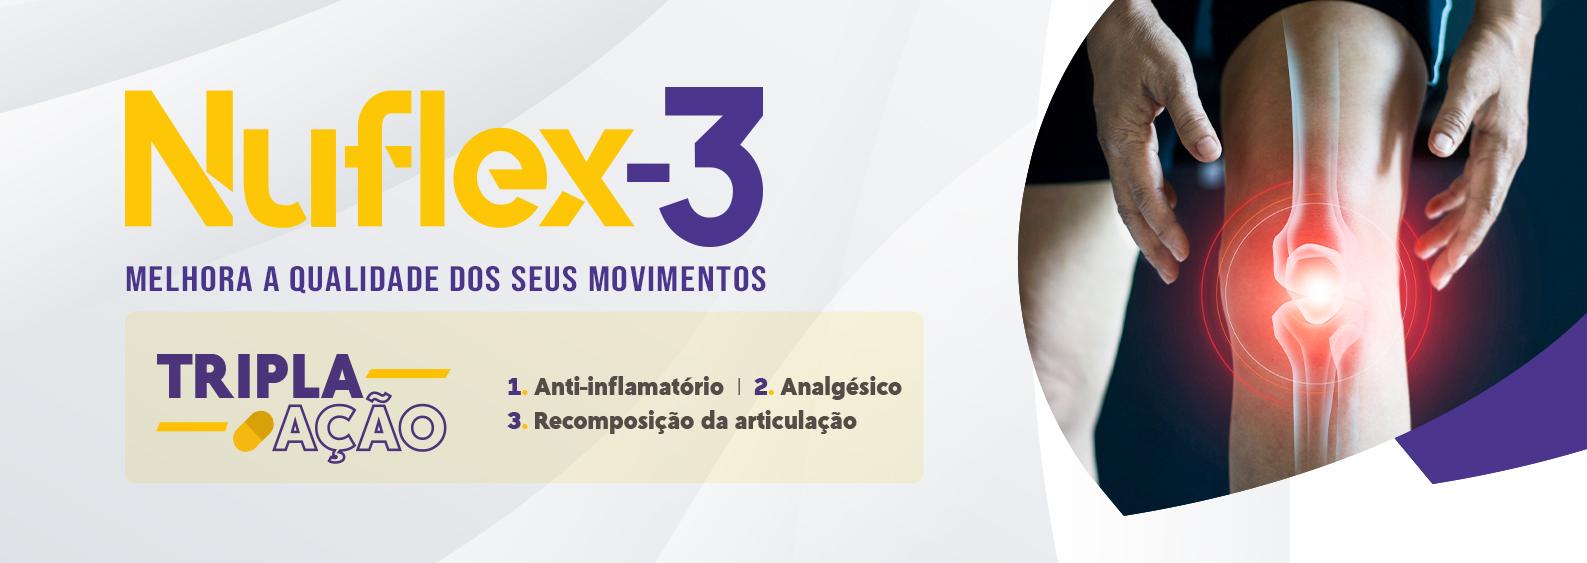 Nuflex3_Produto